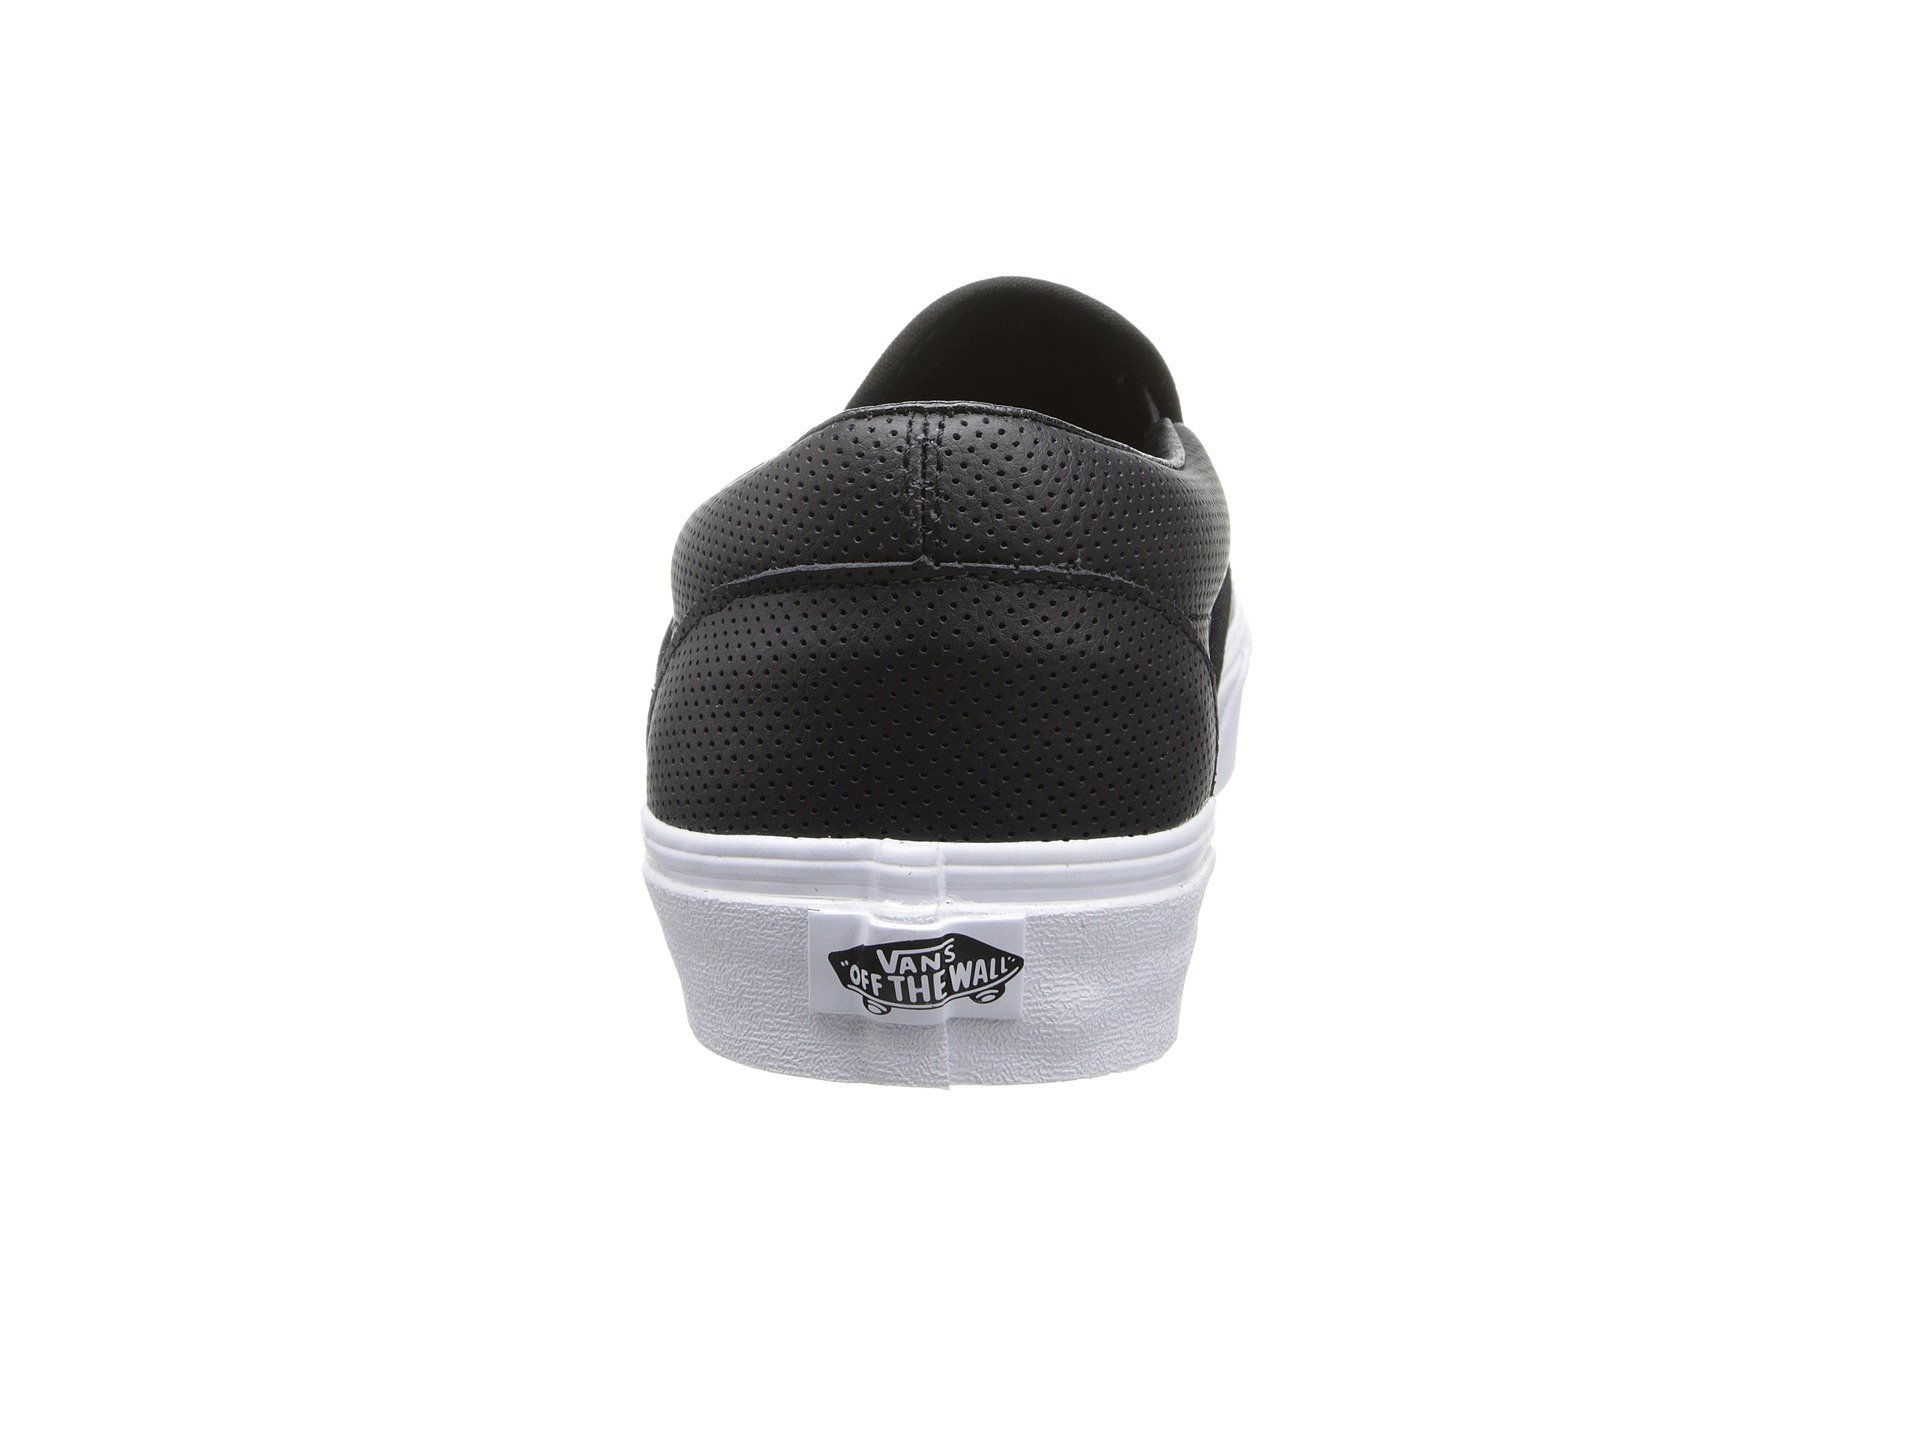 a8c9893c89 Vans Unisex Classic Slip-On  (Perf Leather) Black Mens 5.5